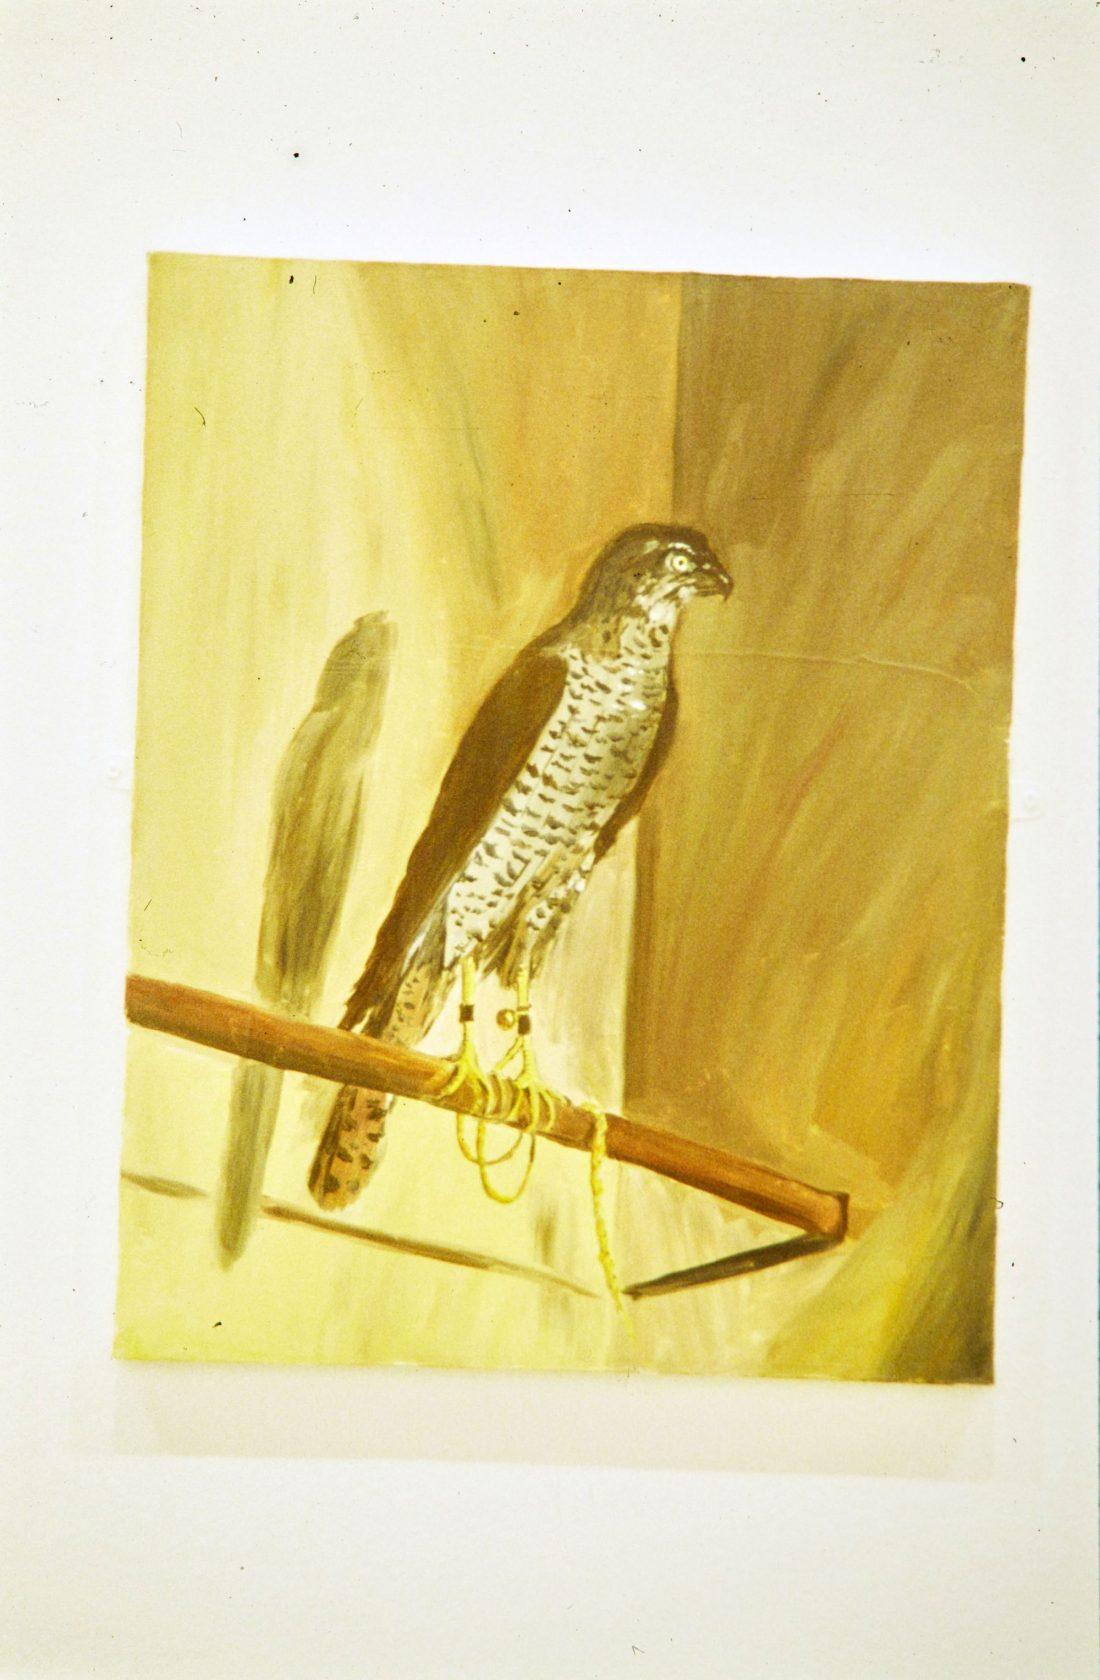 <p>Work on view in Karen Kilimnik's 2000 Solo Exhibition.</p>